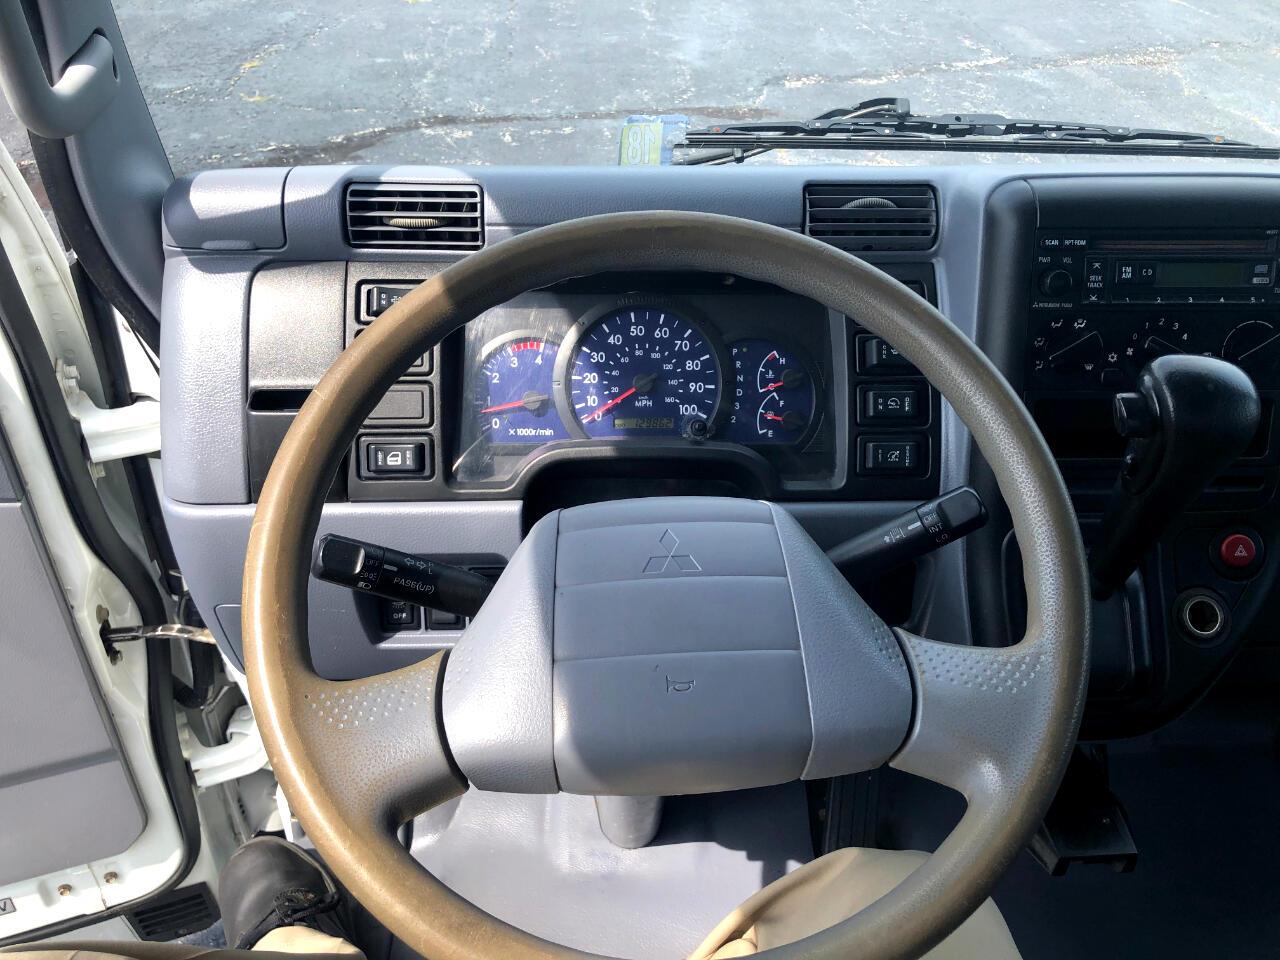 2010 Mitsubishi Fuso FE145 Diesel